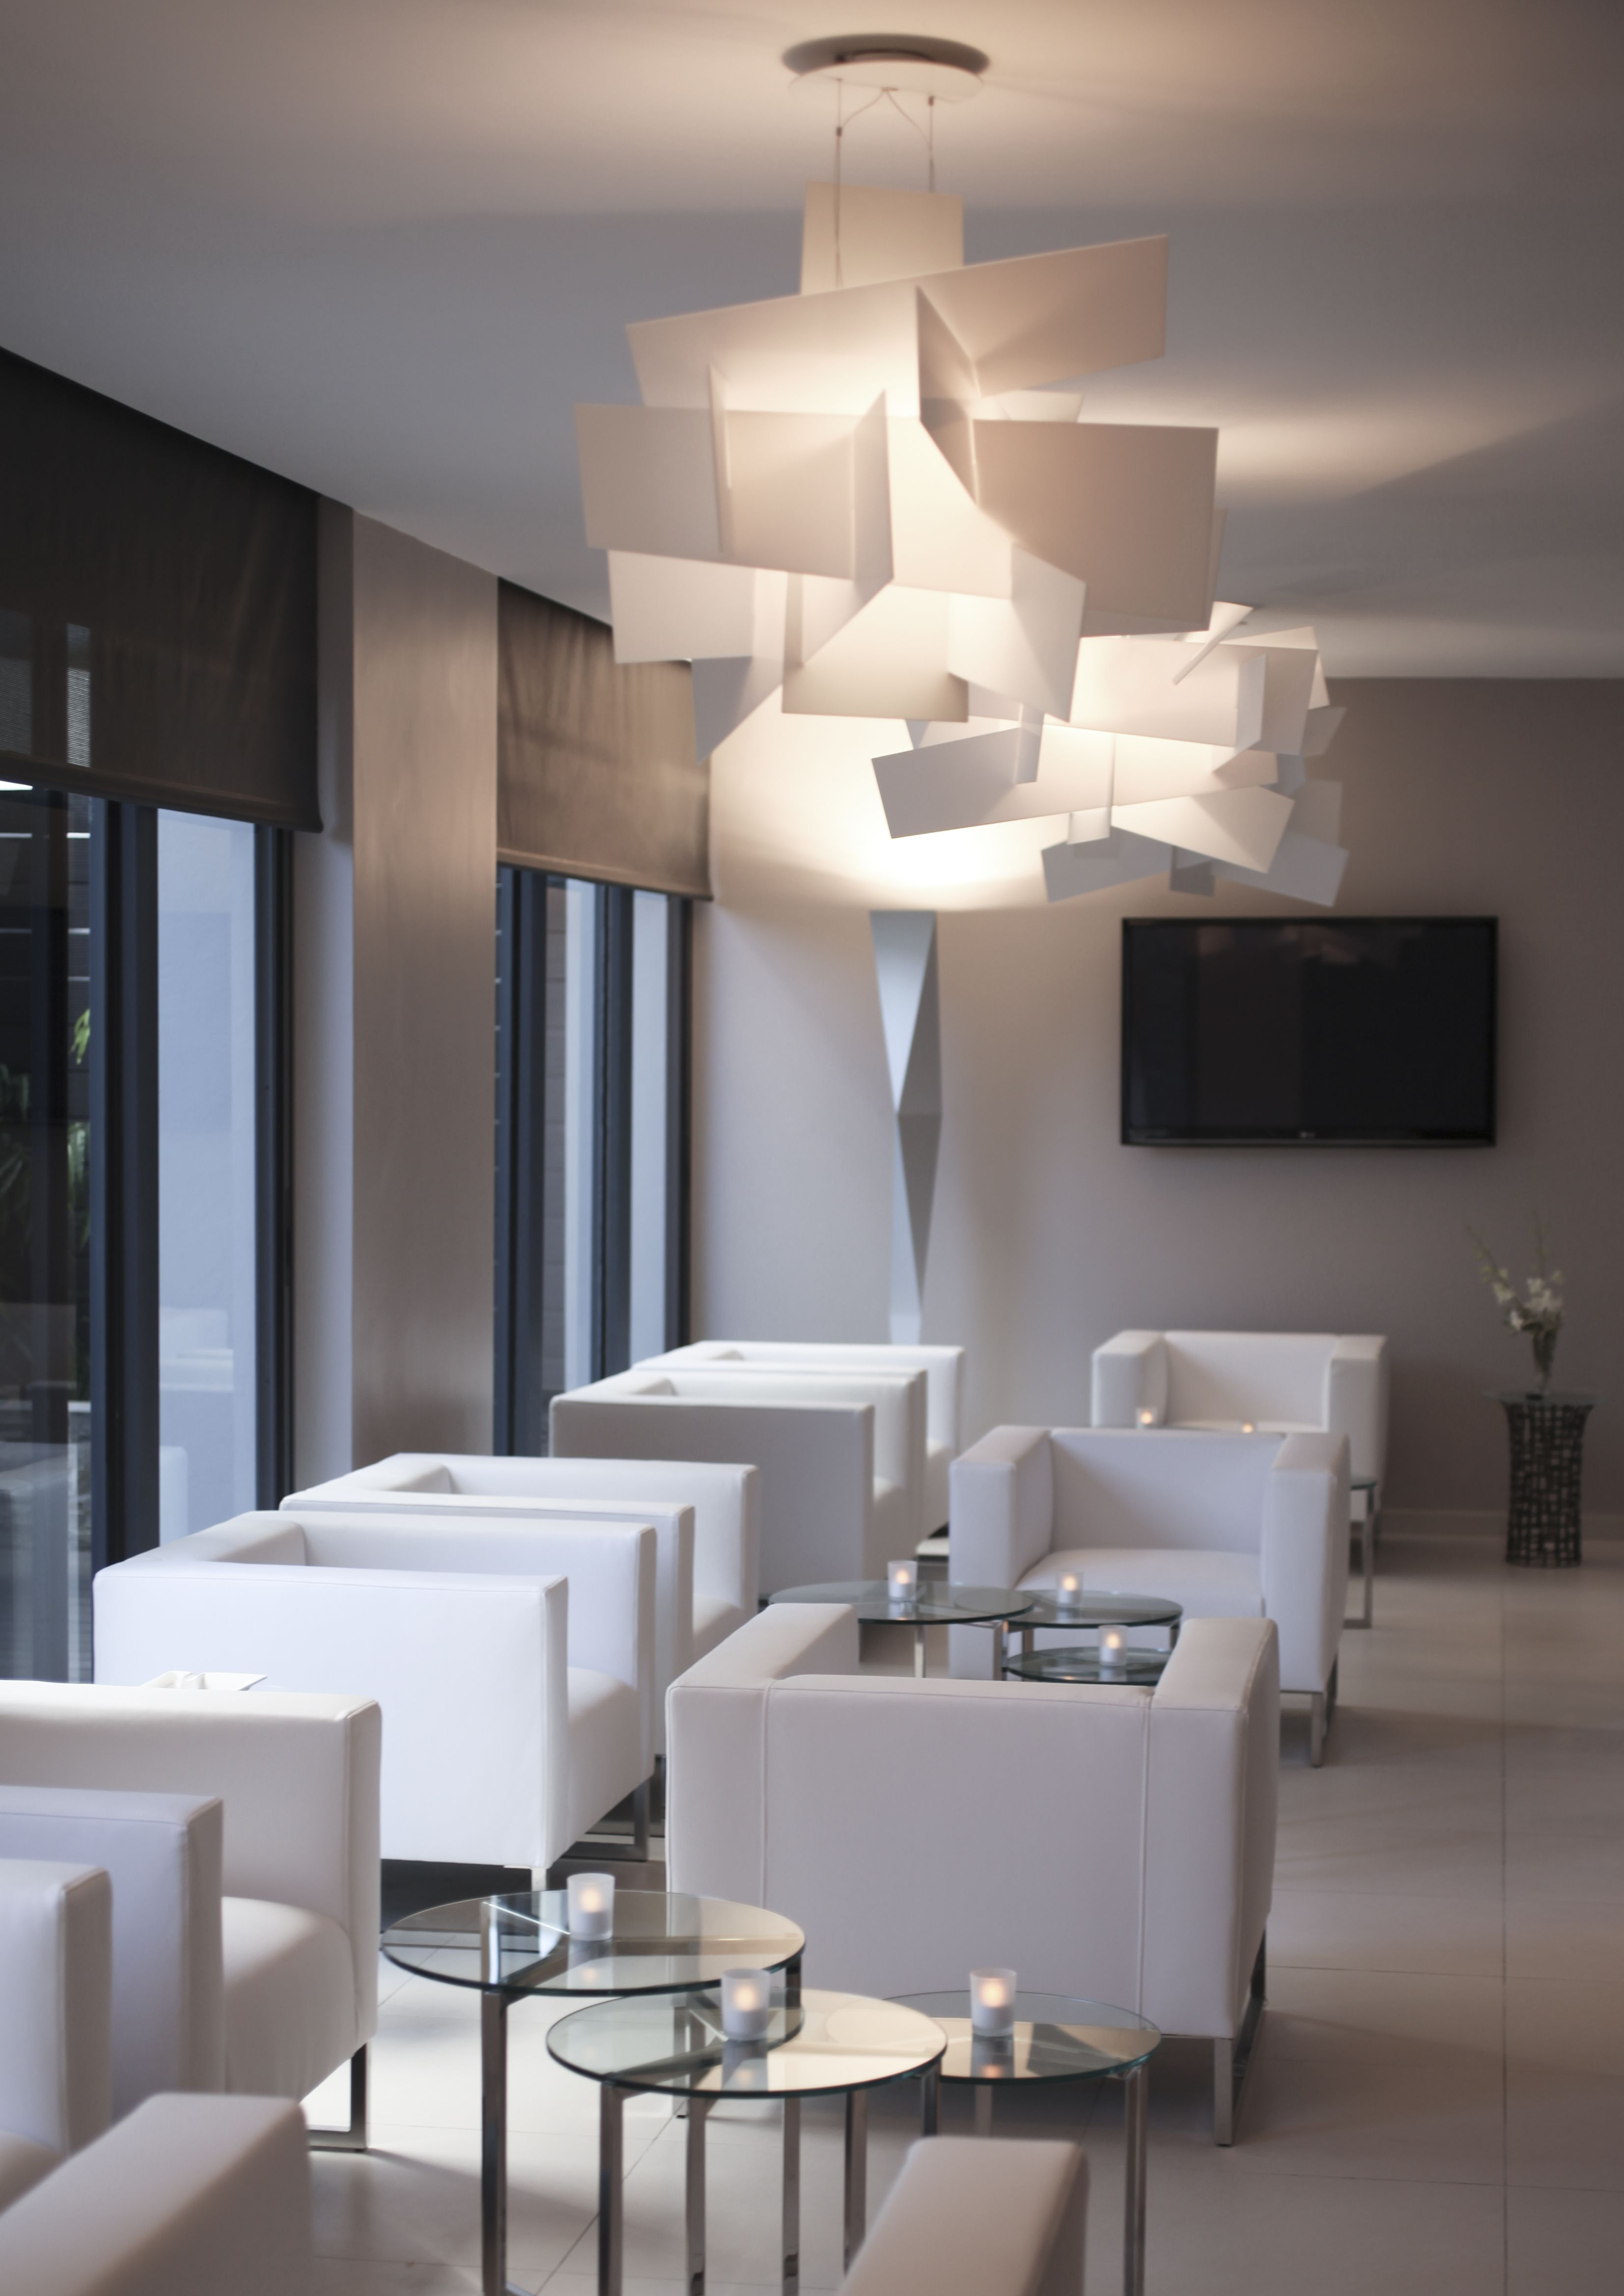 carreaudeco trendy carreaudeco with carreaudeco salle de bain deco carrelage marocain pour. Black Bedroom Furniture Sets. Home Design Ideas